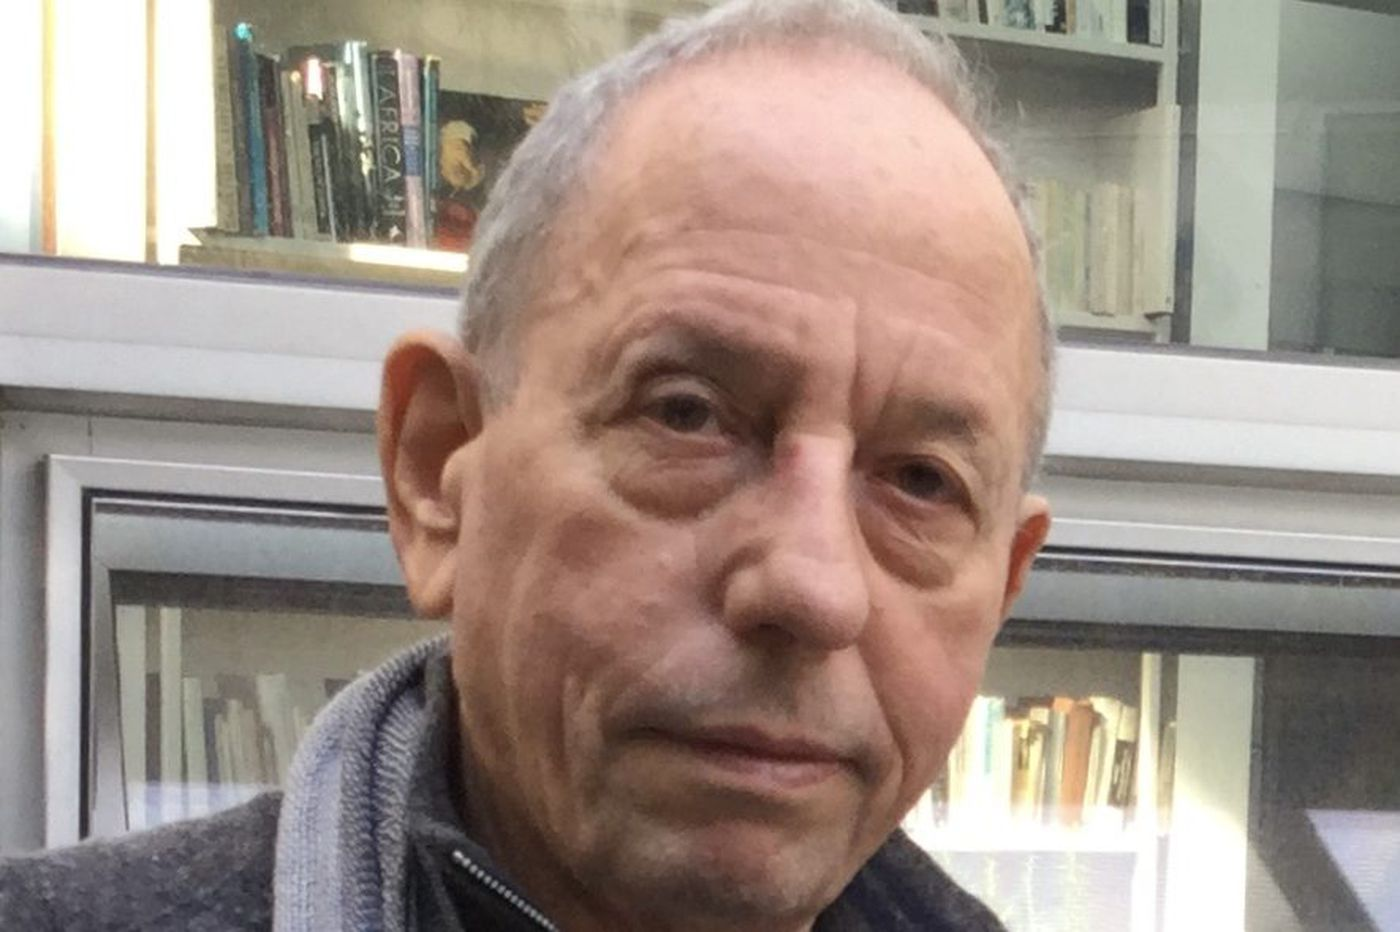 David S. Slovic, 77, renowned postmodern architect